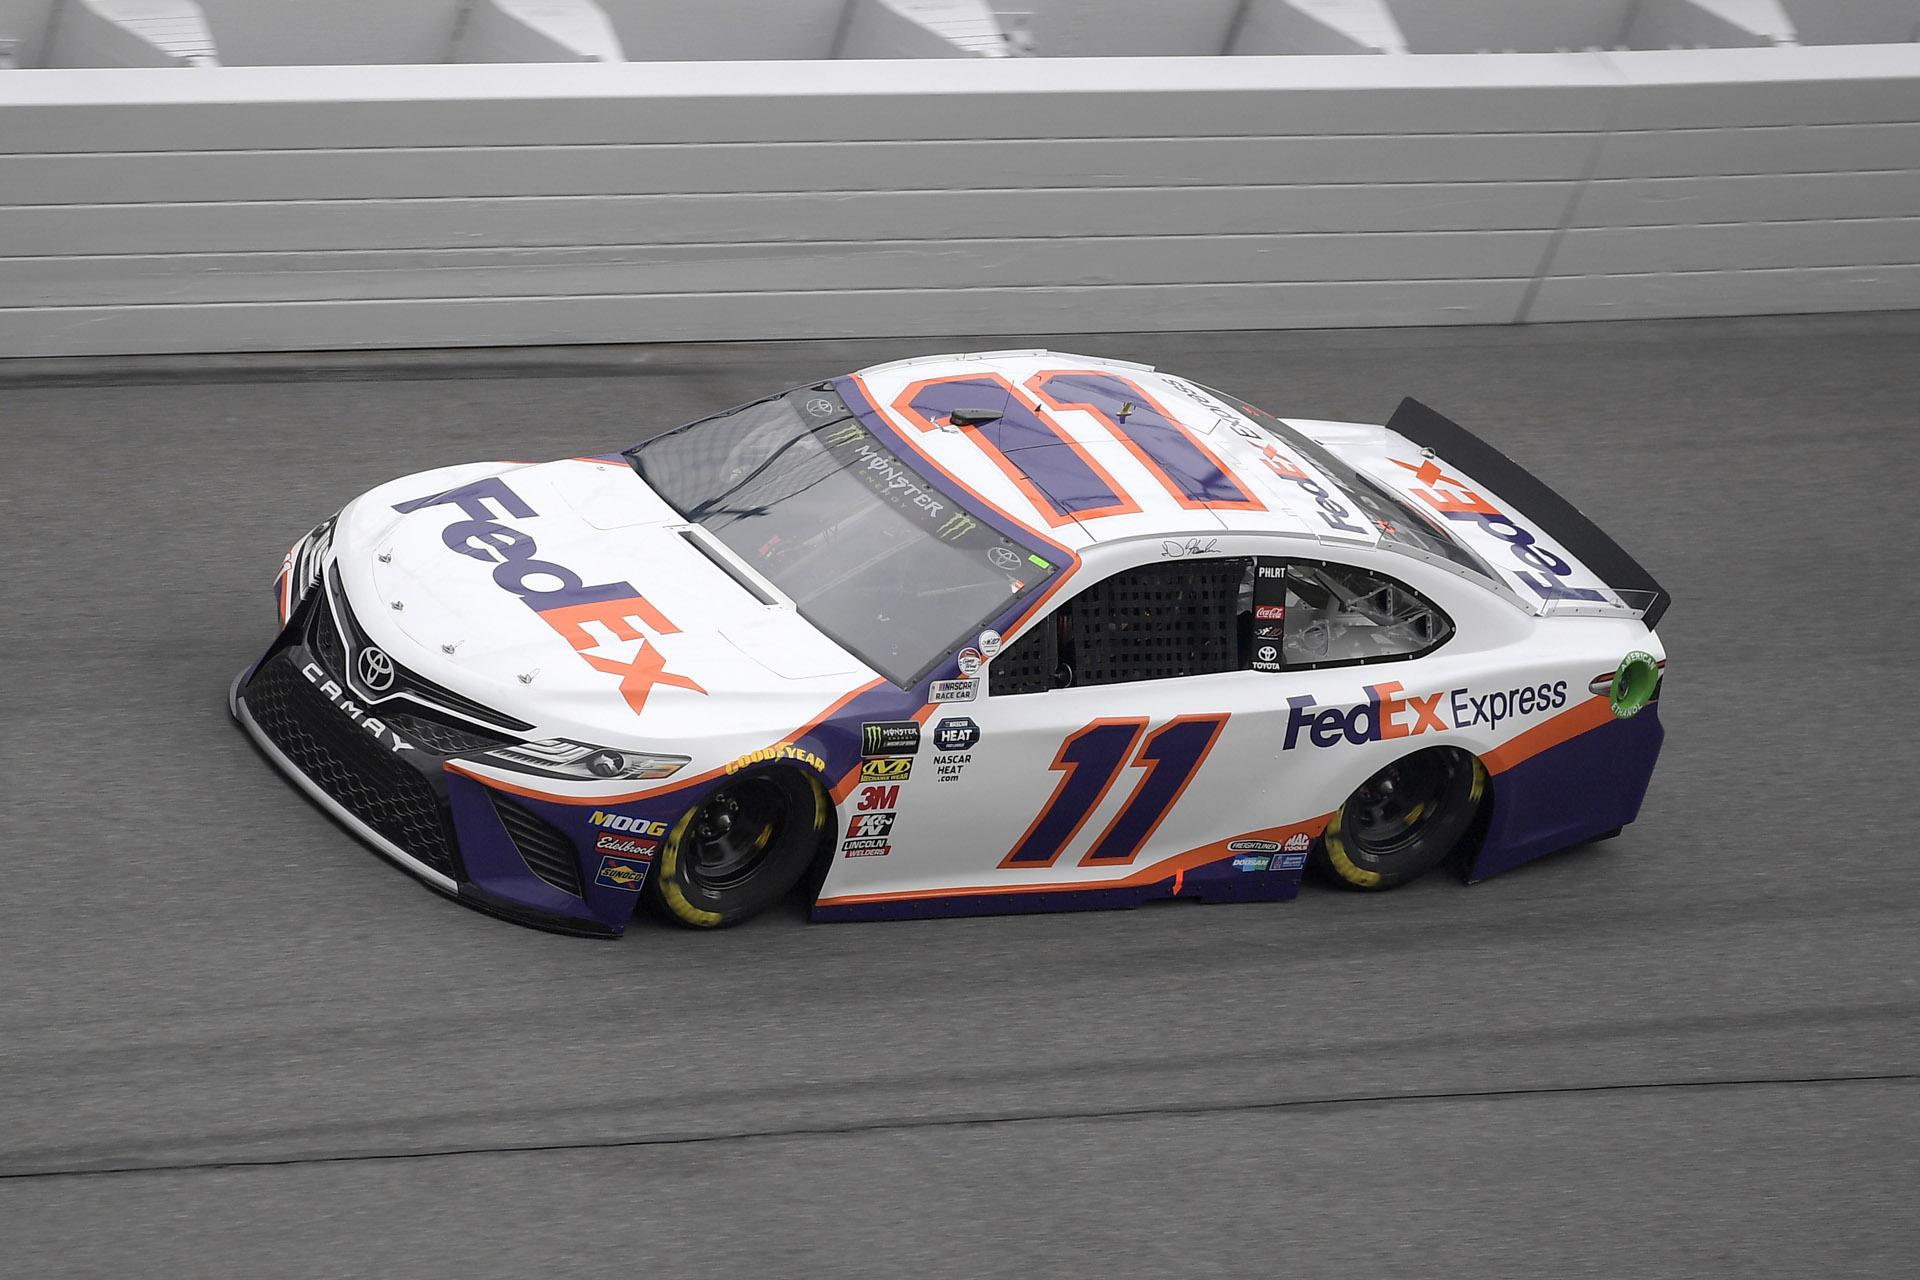 NASCAR Daytona 500 Auto Racing_1550450081323